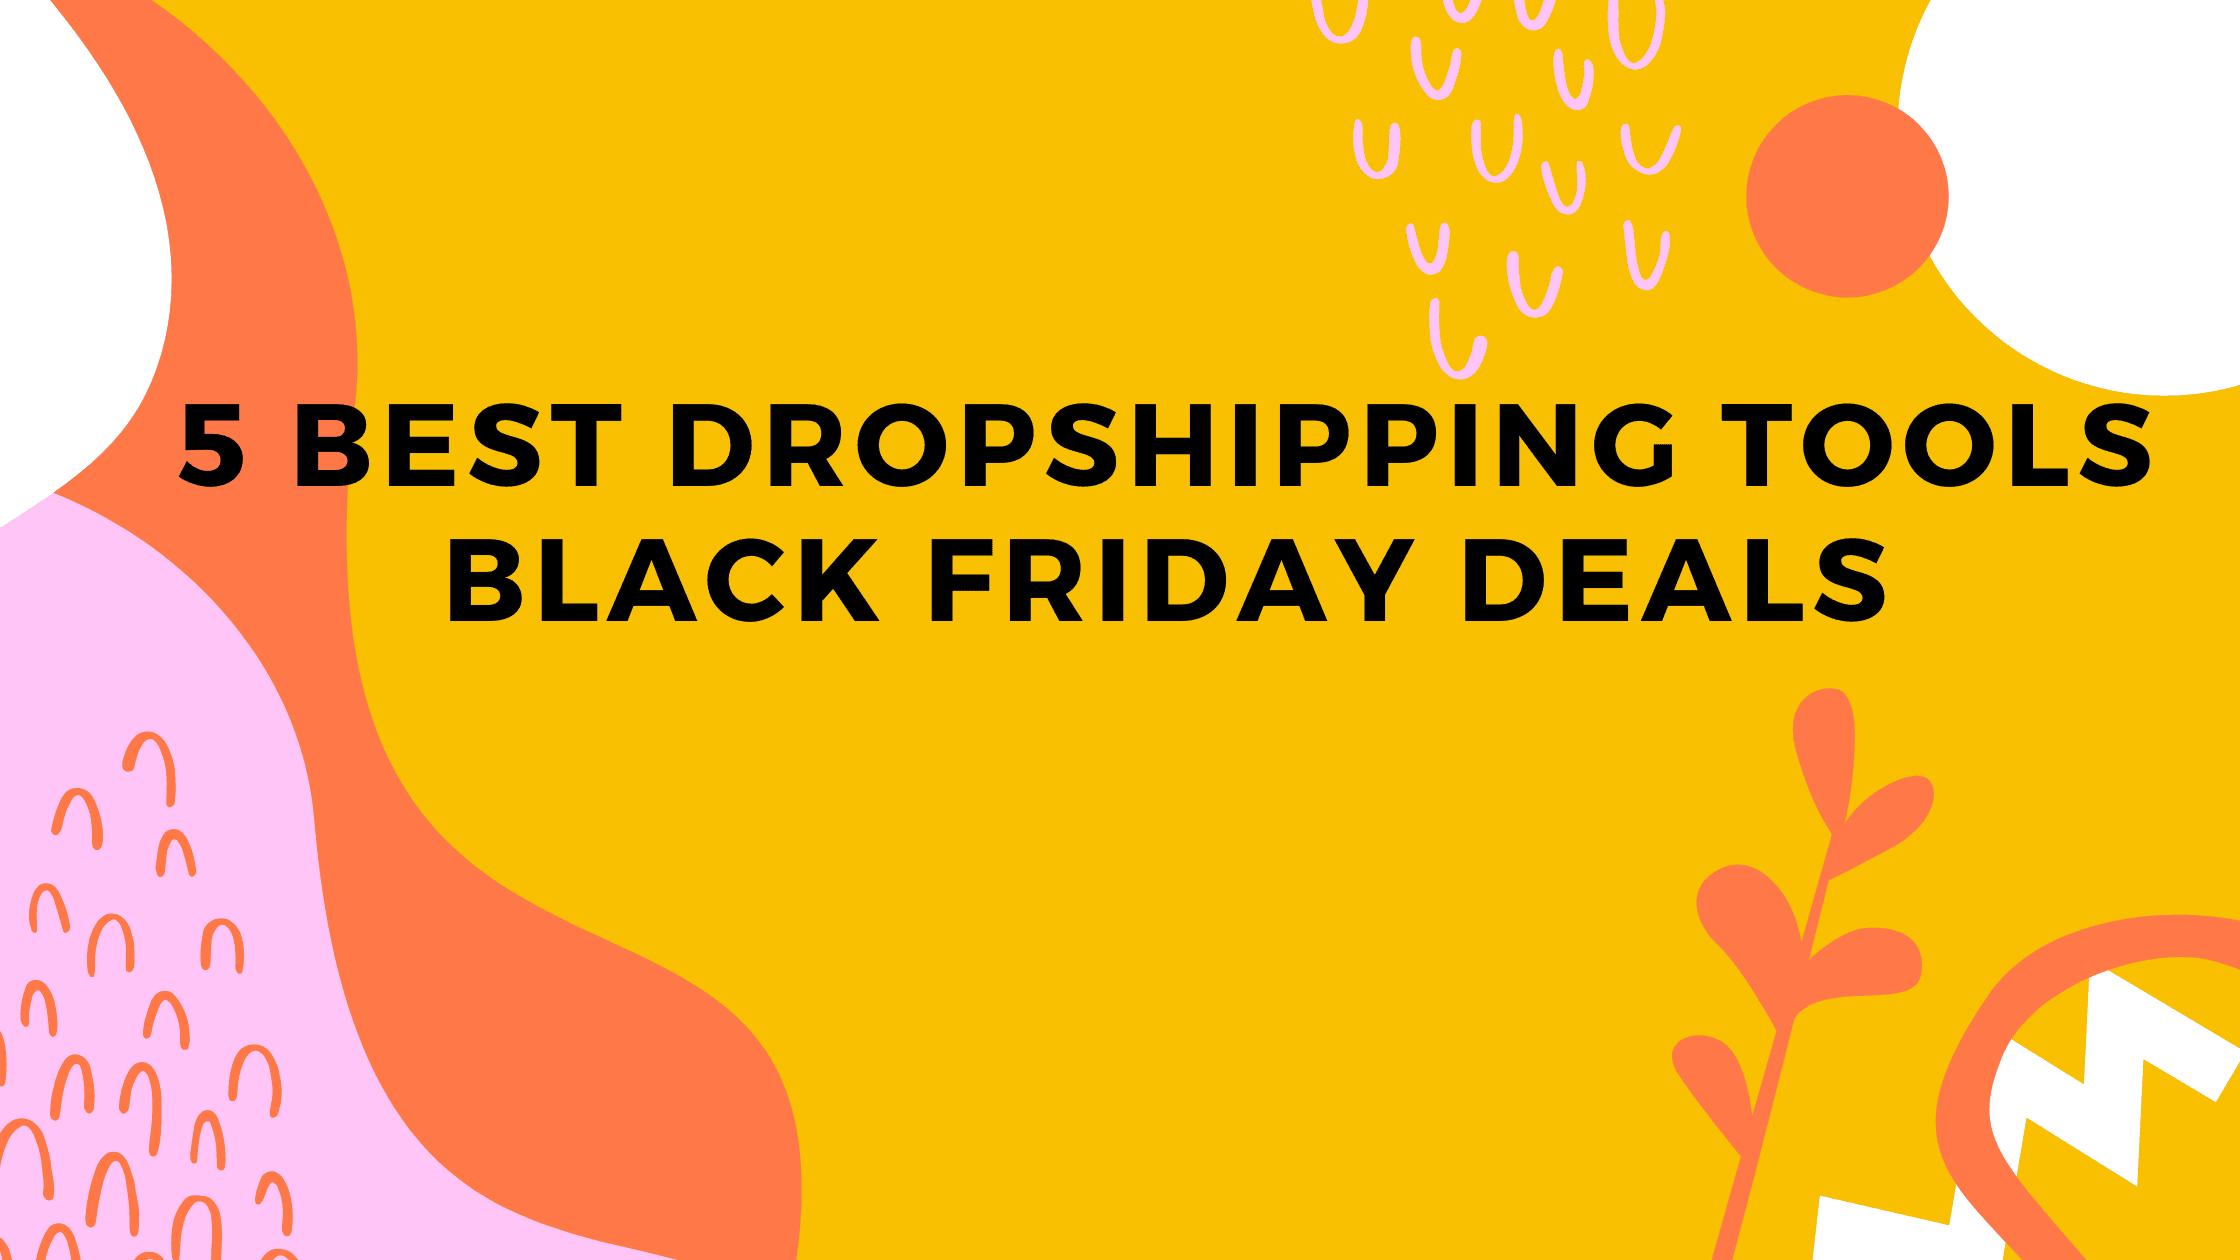 5 Best Dropshipping Tools Black Friday Deals